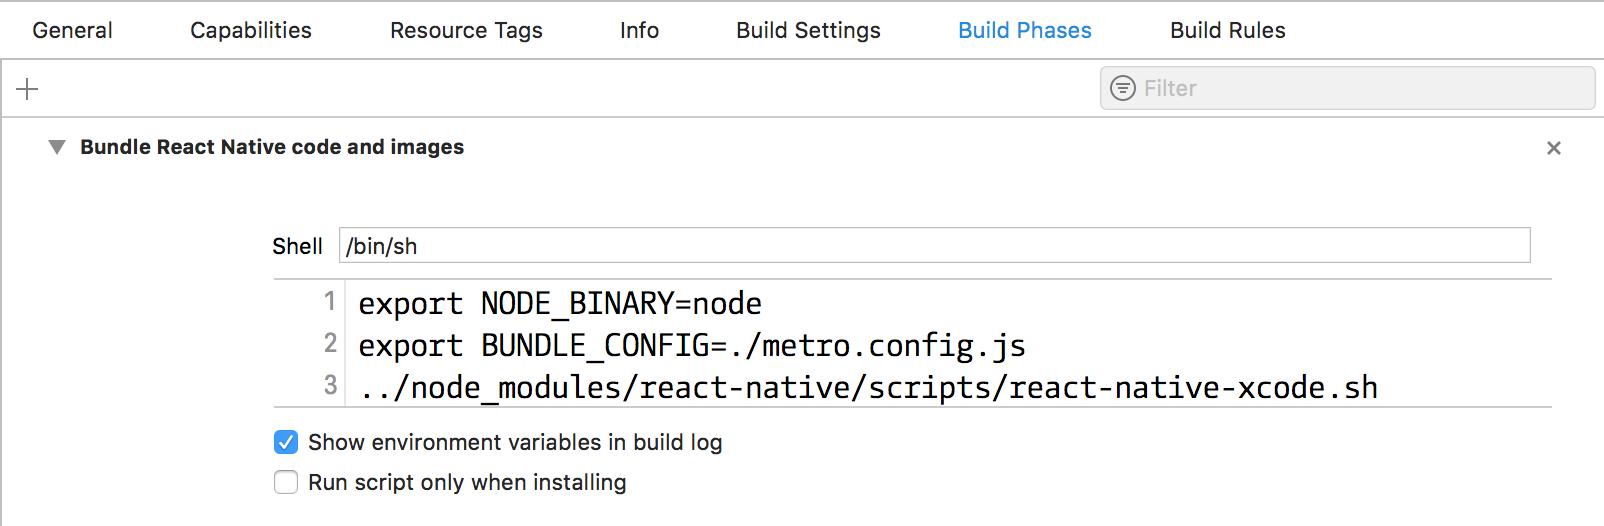 Xcode bundle config